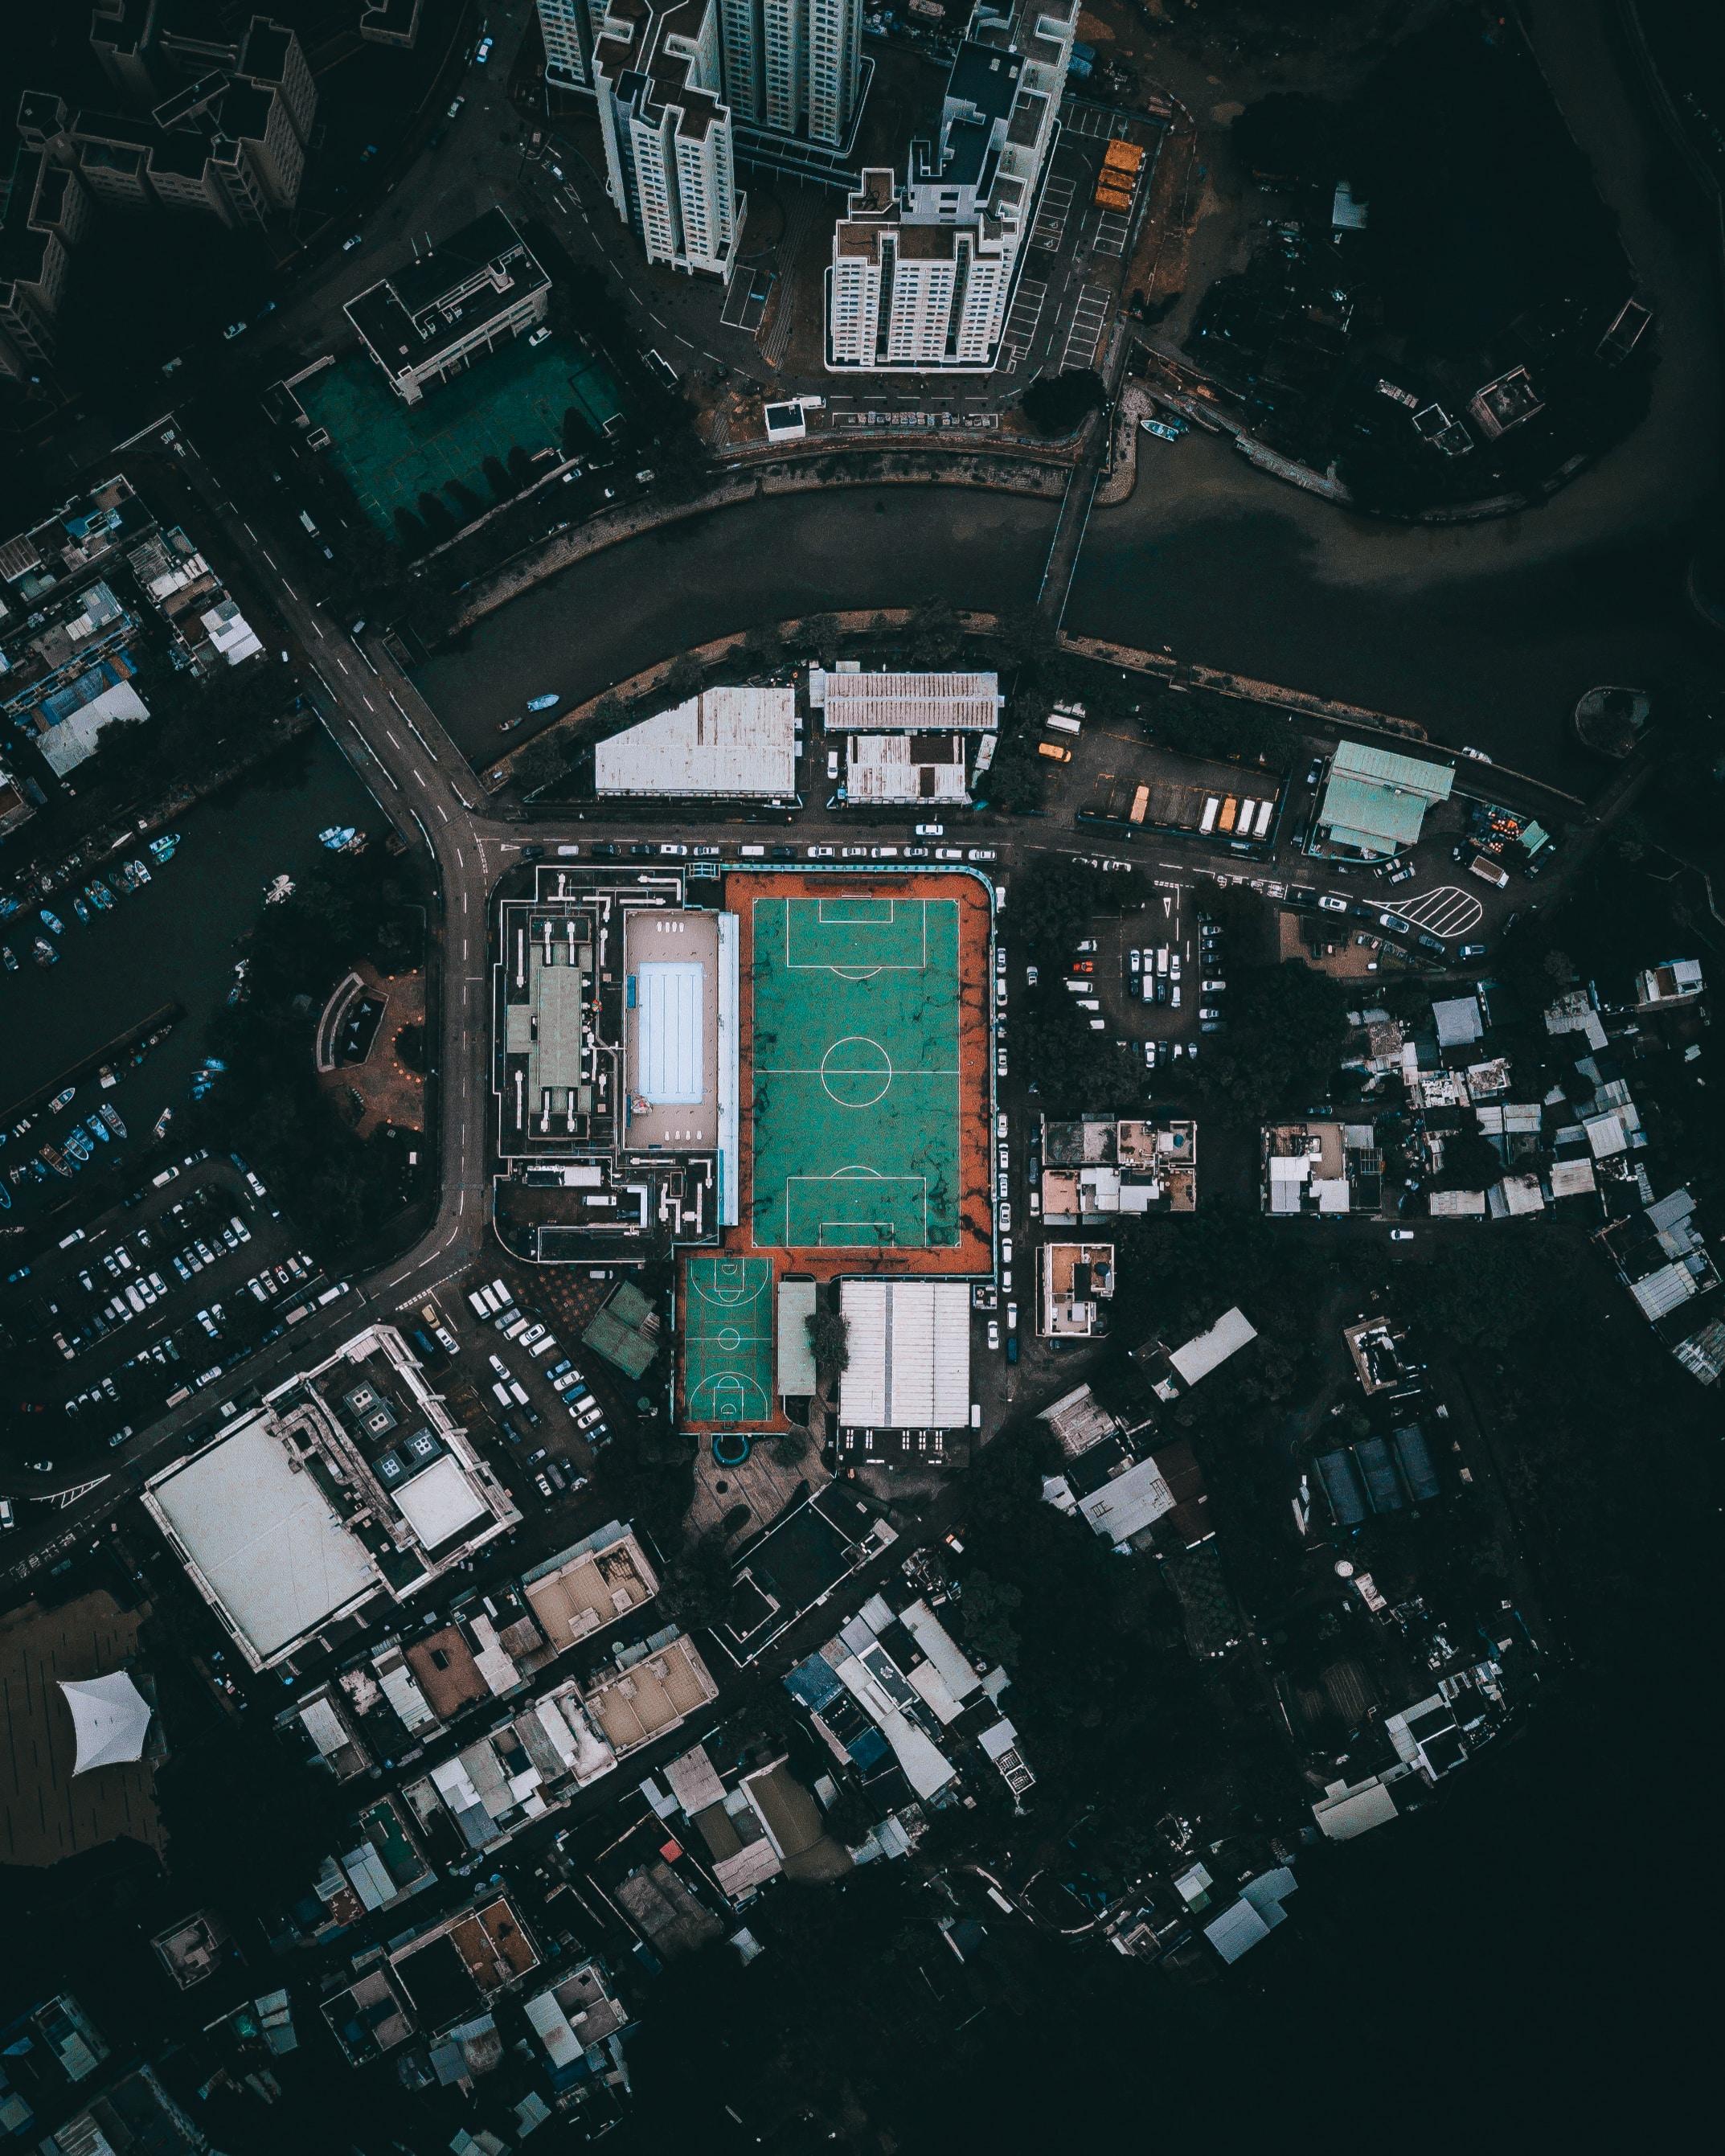 bird's eye view of soccer fiield